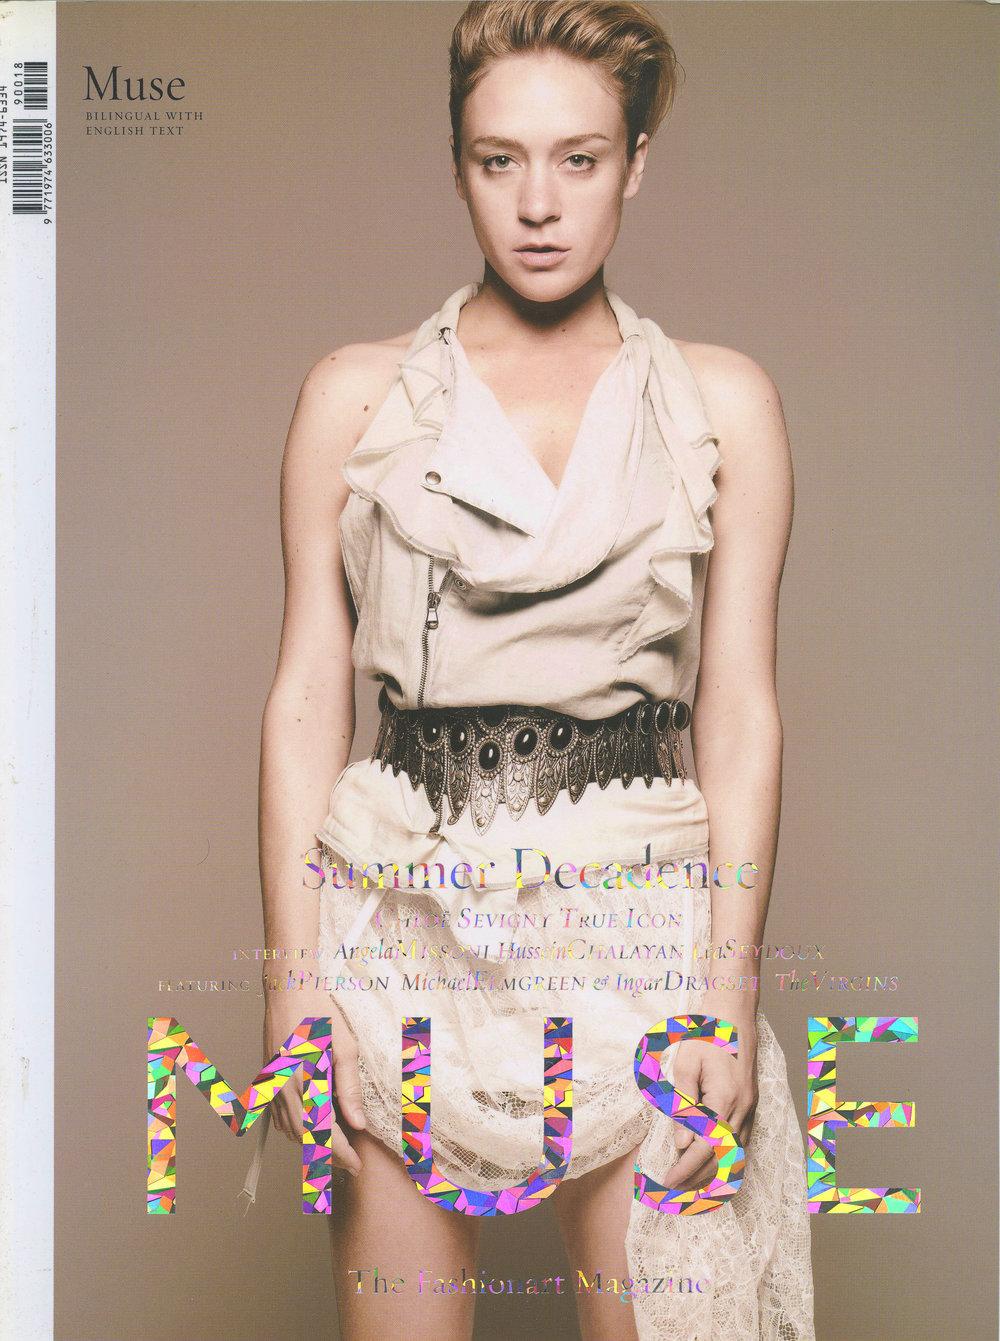 Chloë-Sevigny-muse-cover .jpg